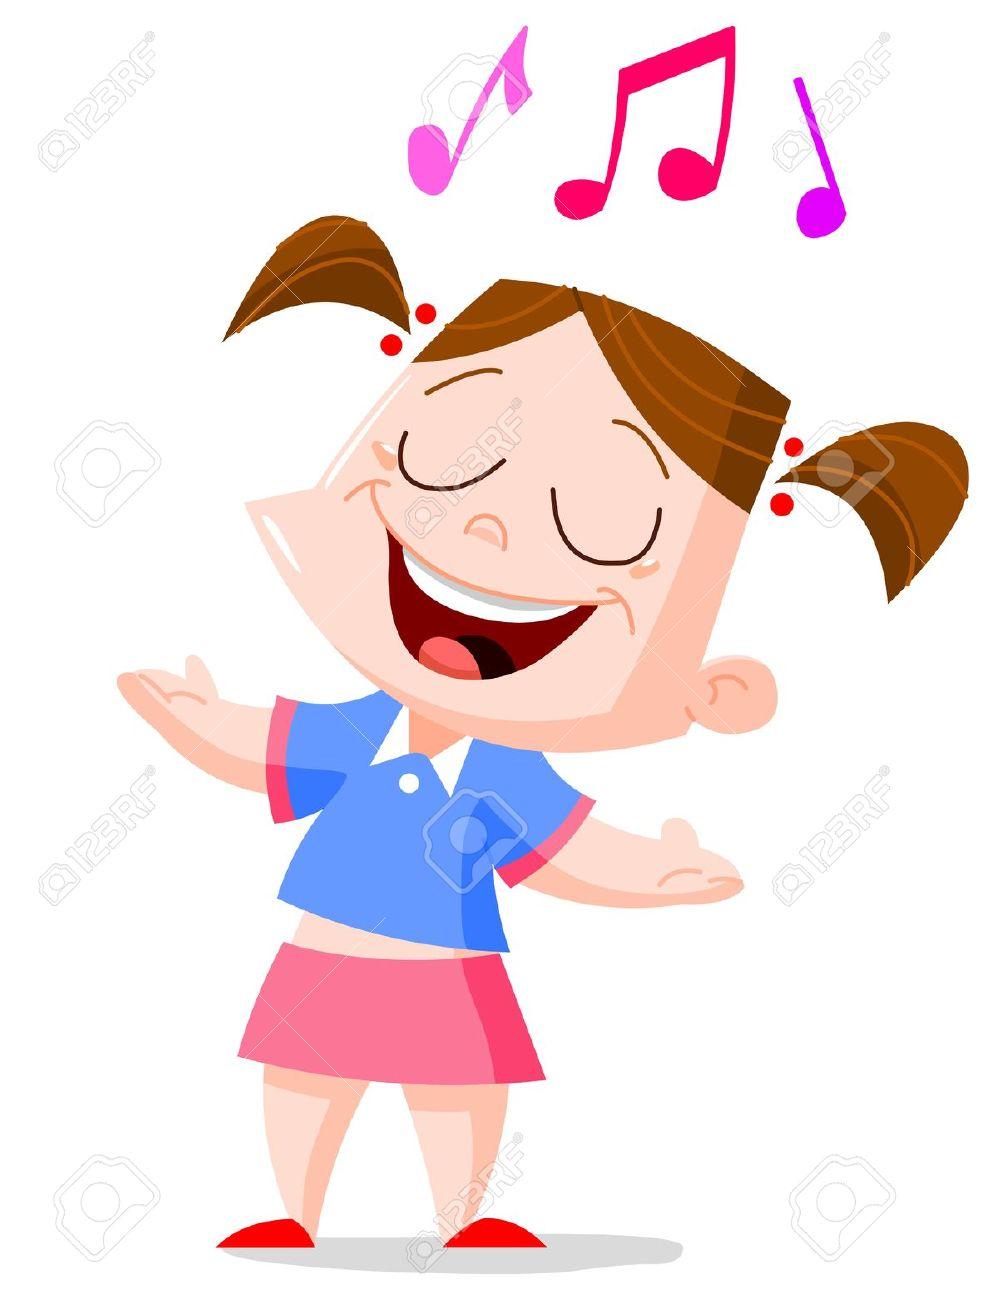 Singer clipart cute cartoon Singing clipart  98 Sing